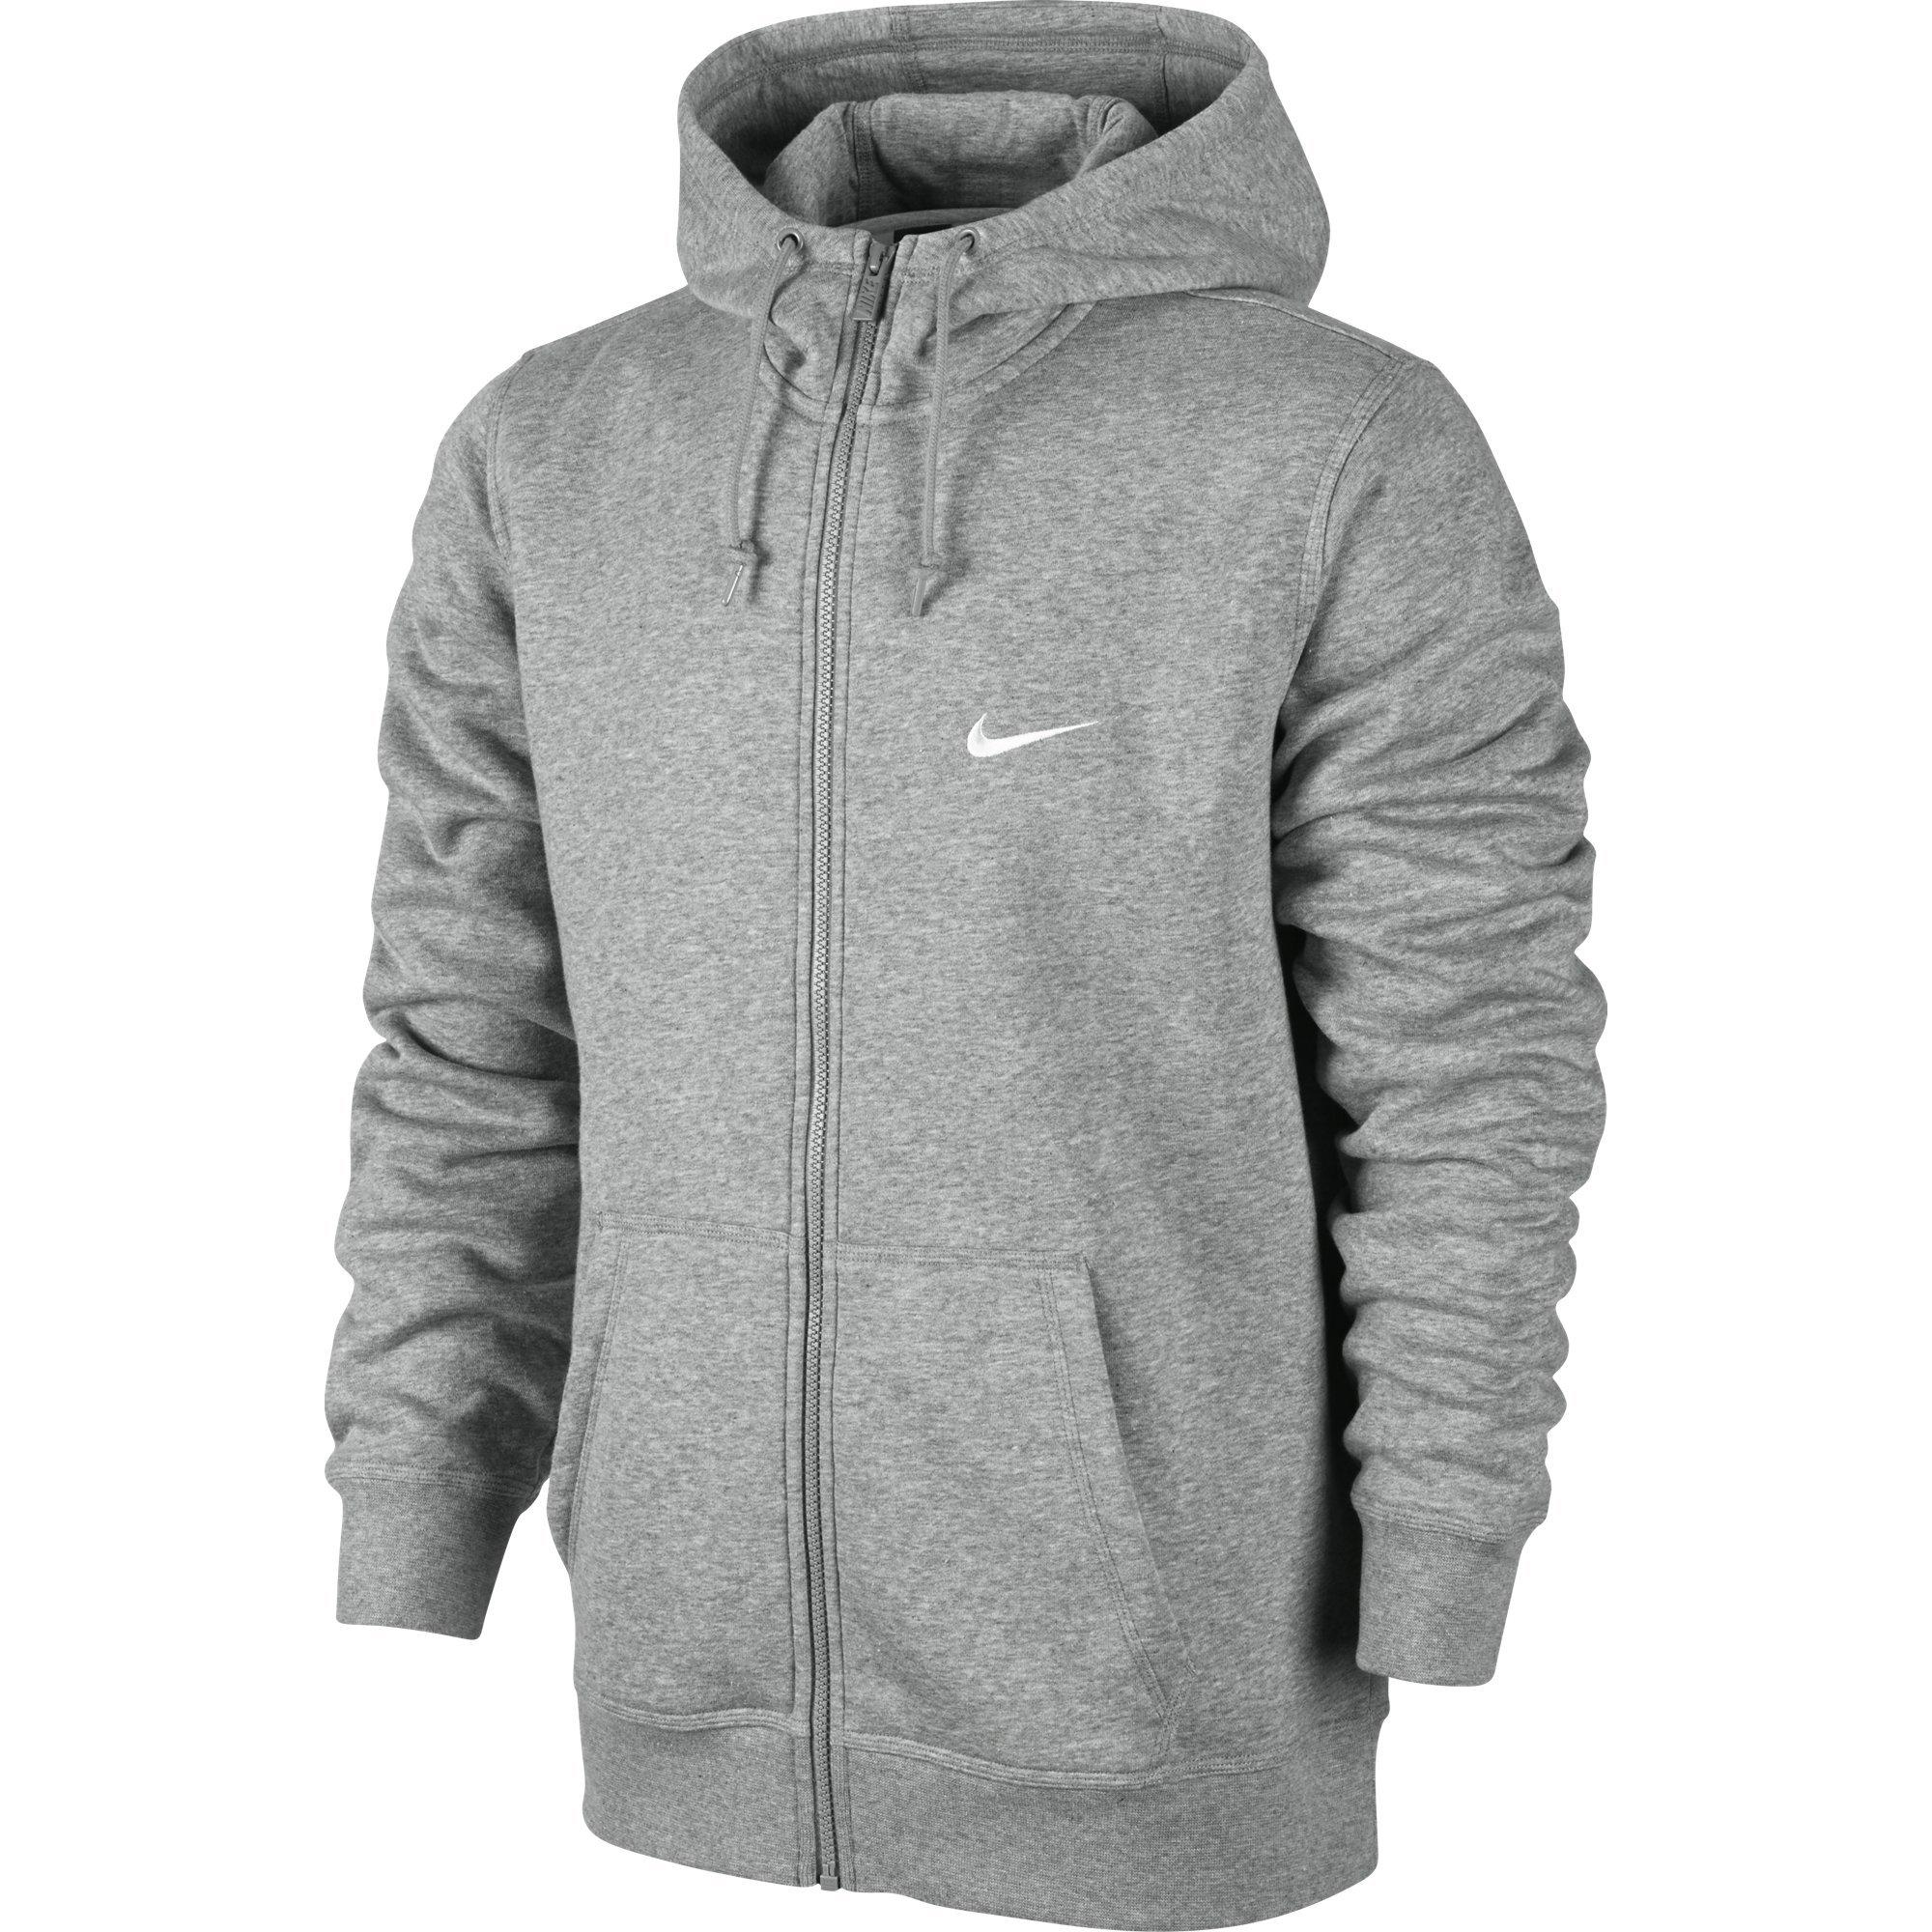 85ad18a62 Galleon - Nike Men's Club Swoosh Full-Zip Hoodie, Dark Grey Heather, Large